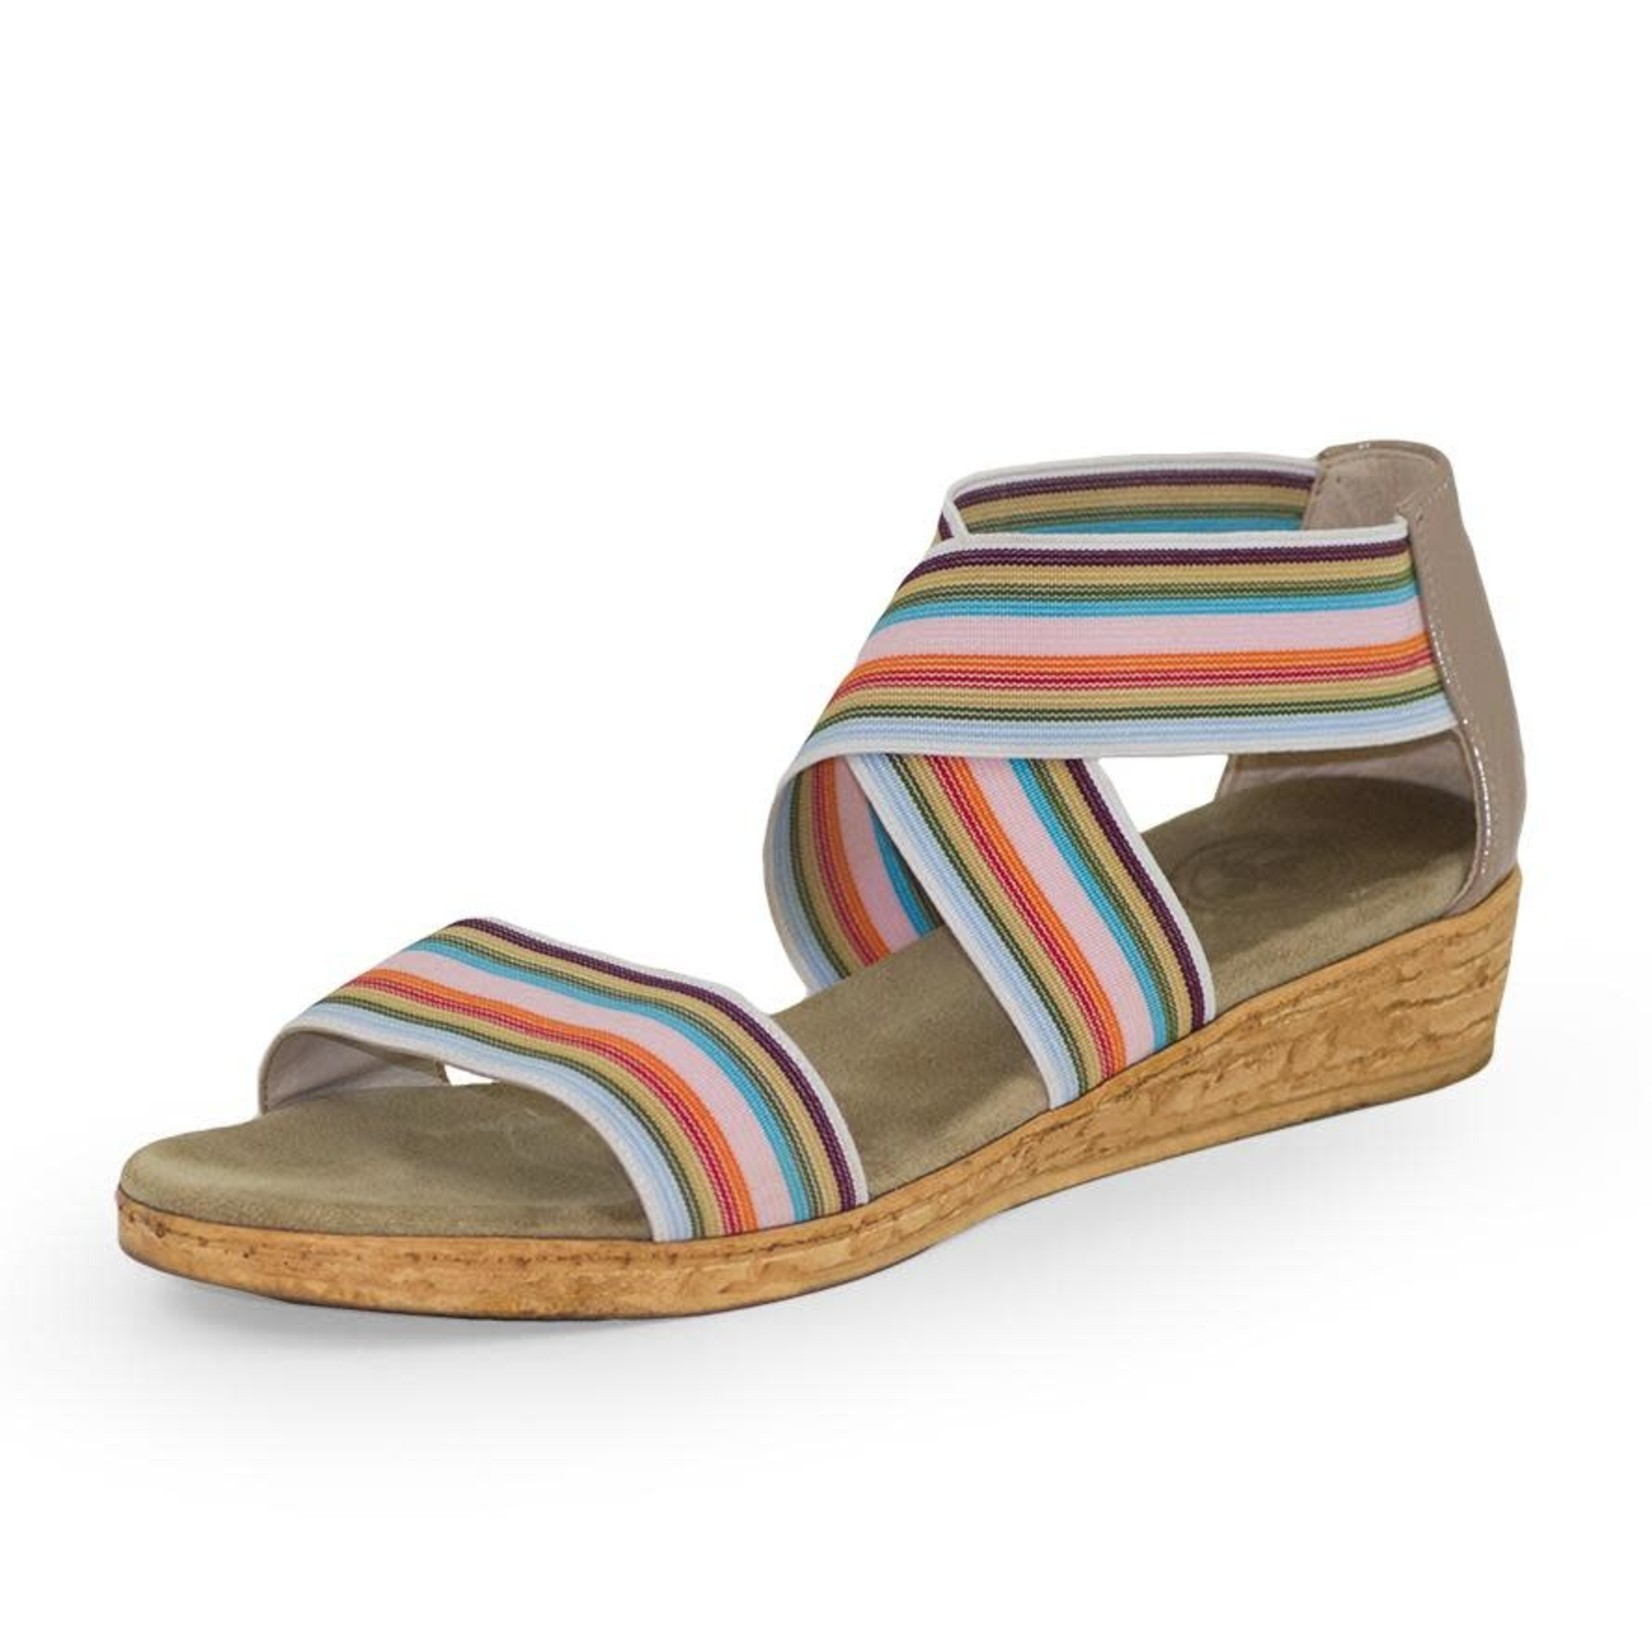 Peri Shoe in Multi Stripe 11